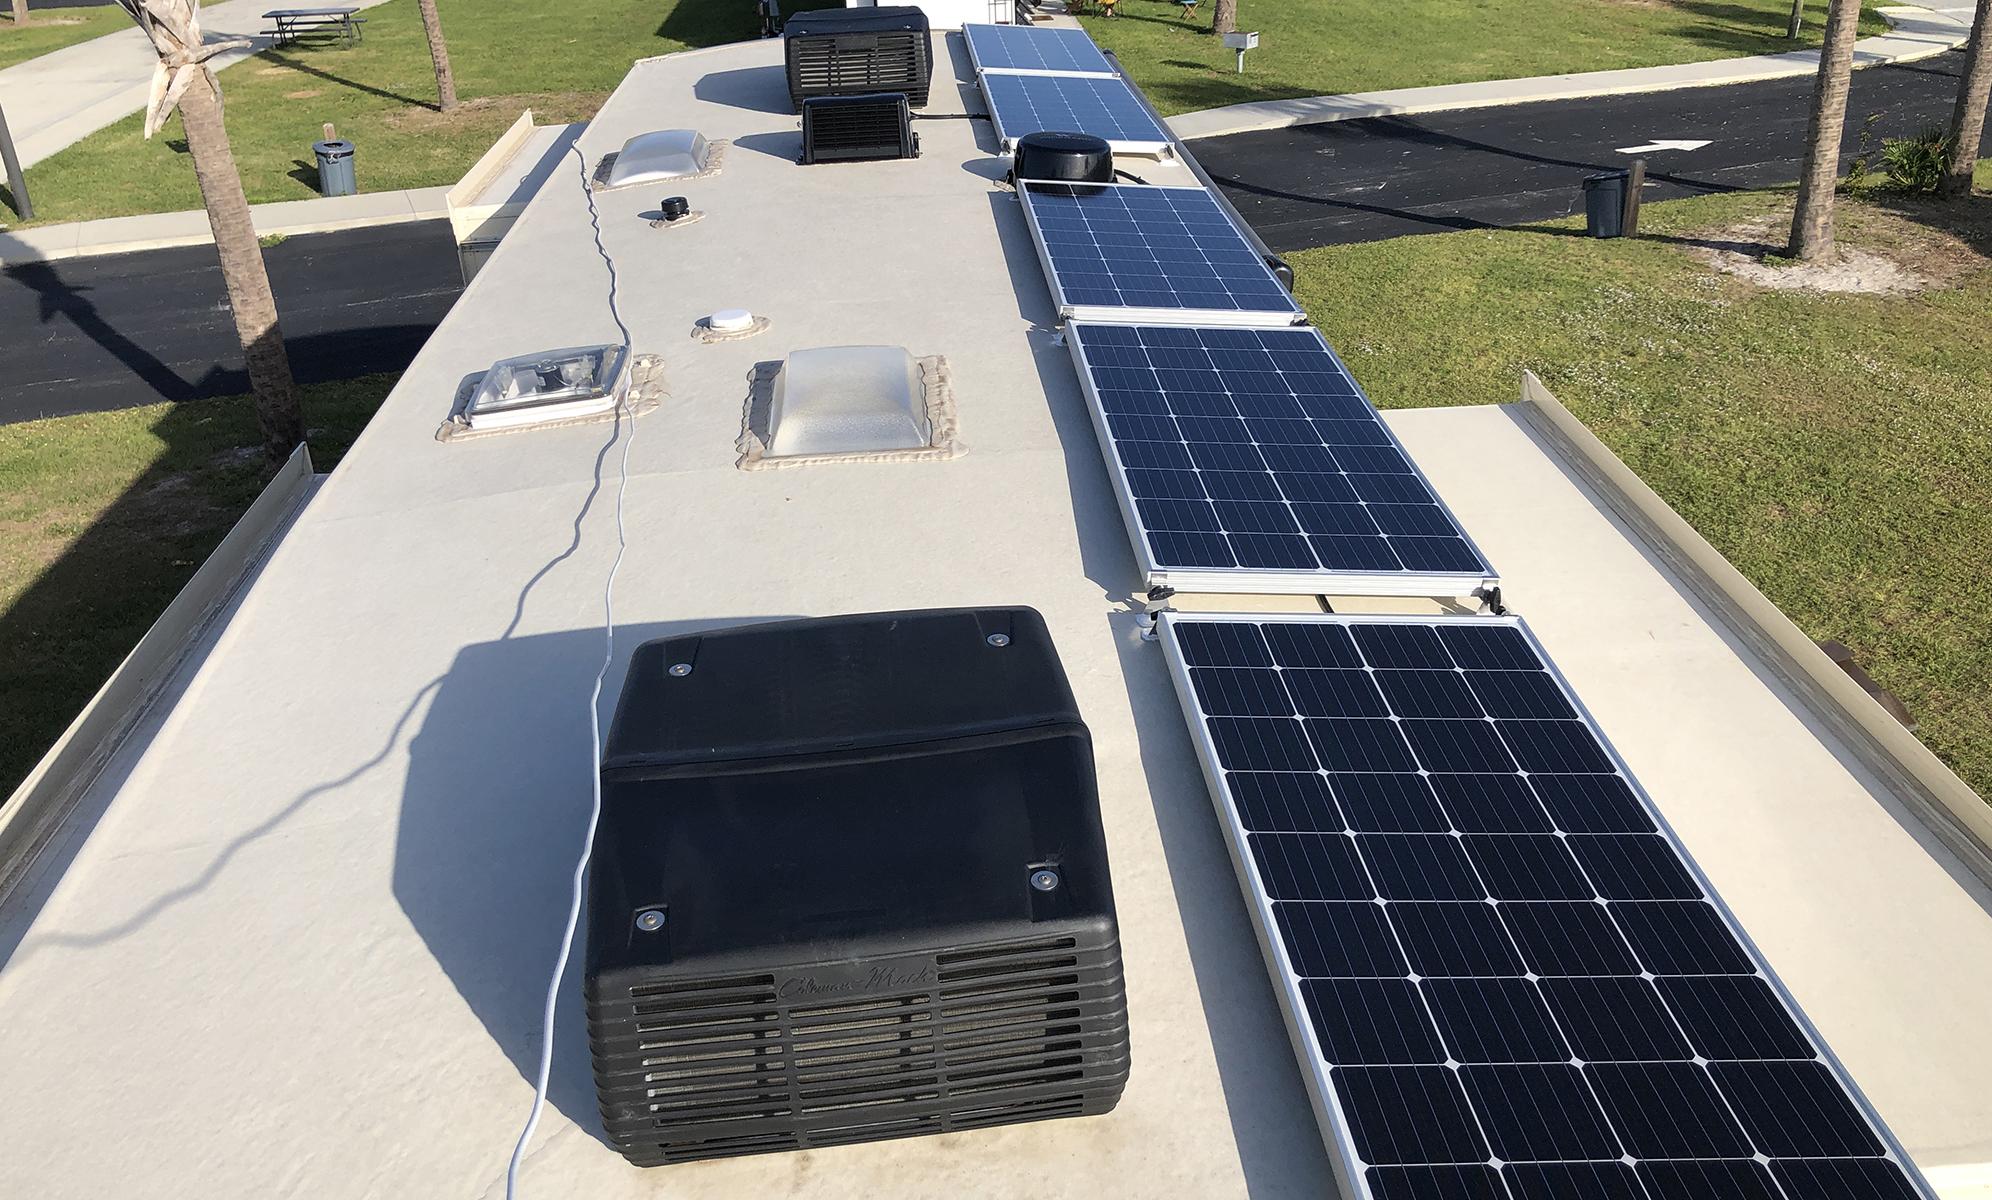 Solar Panels Off Grid Boondocking 5th Wheel RV